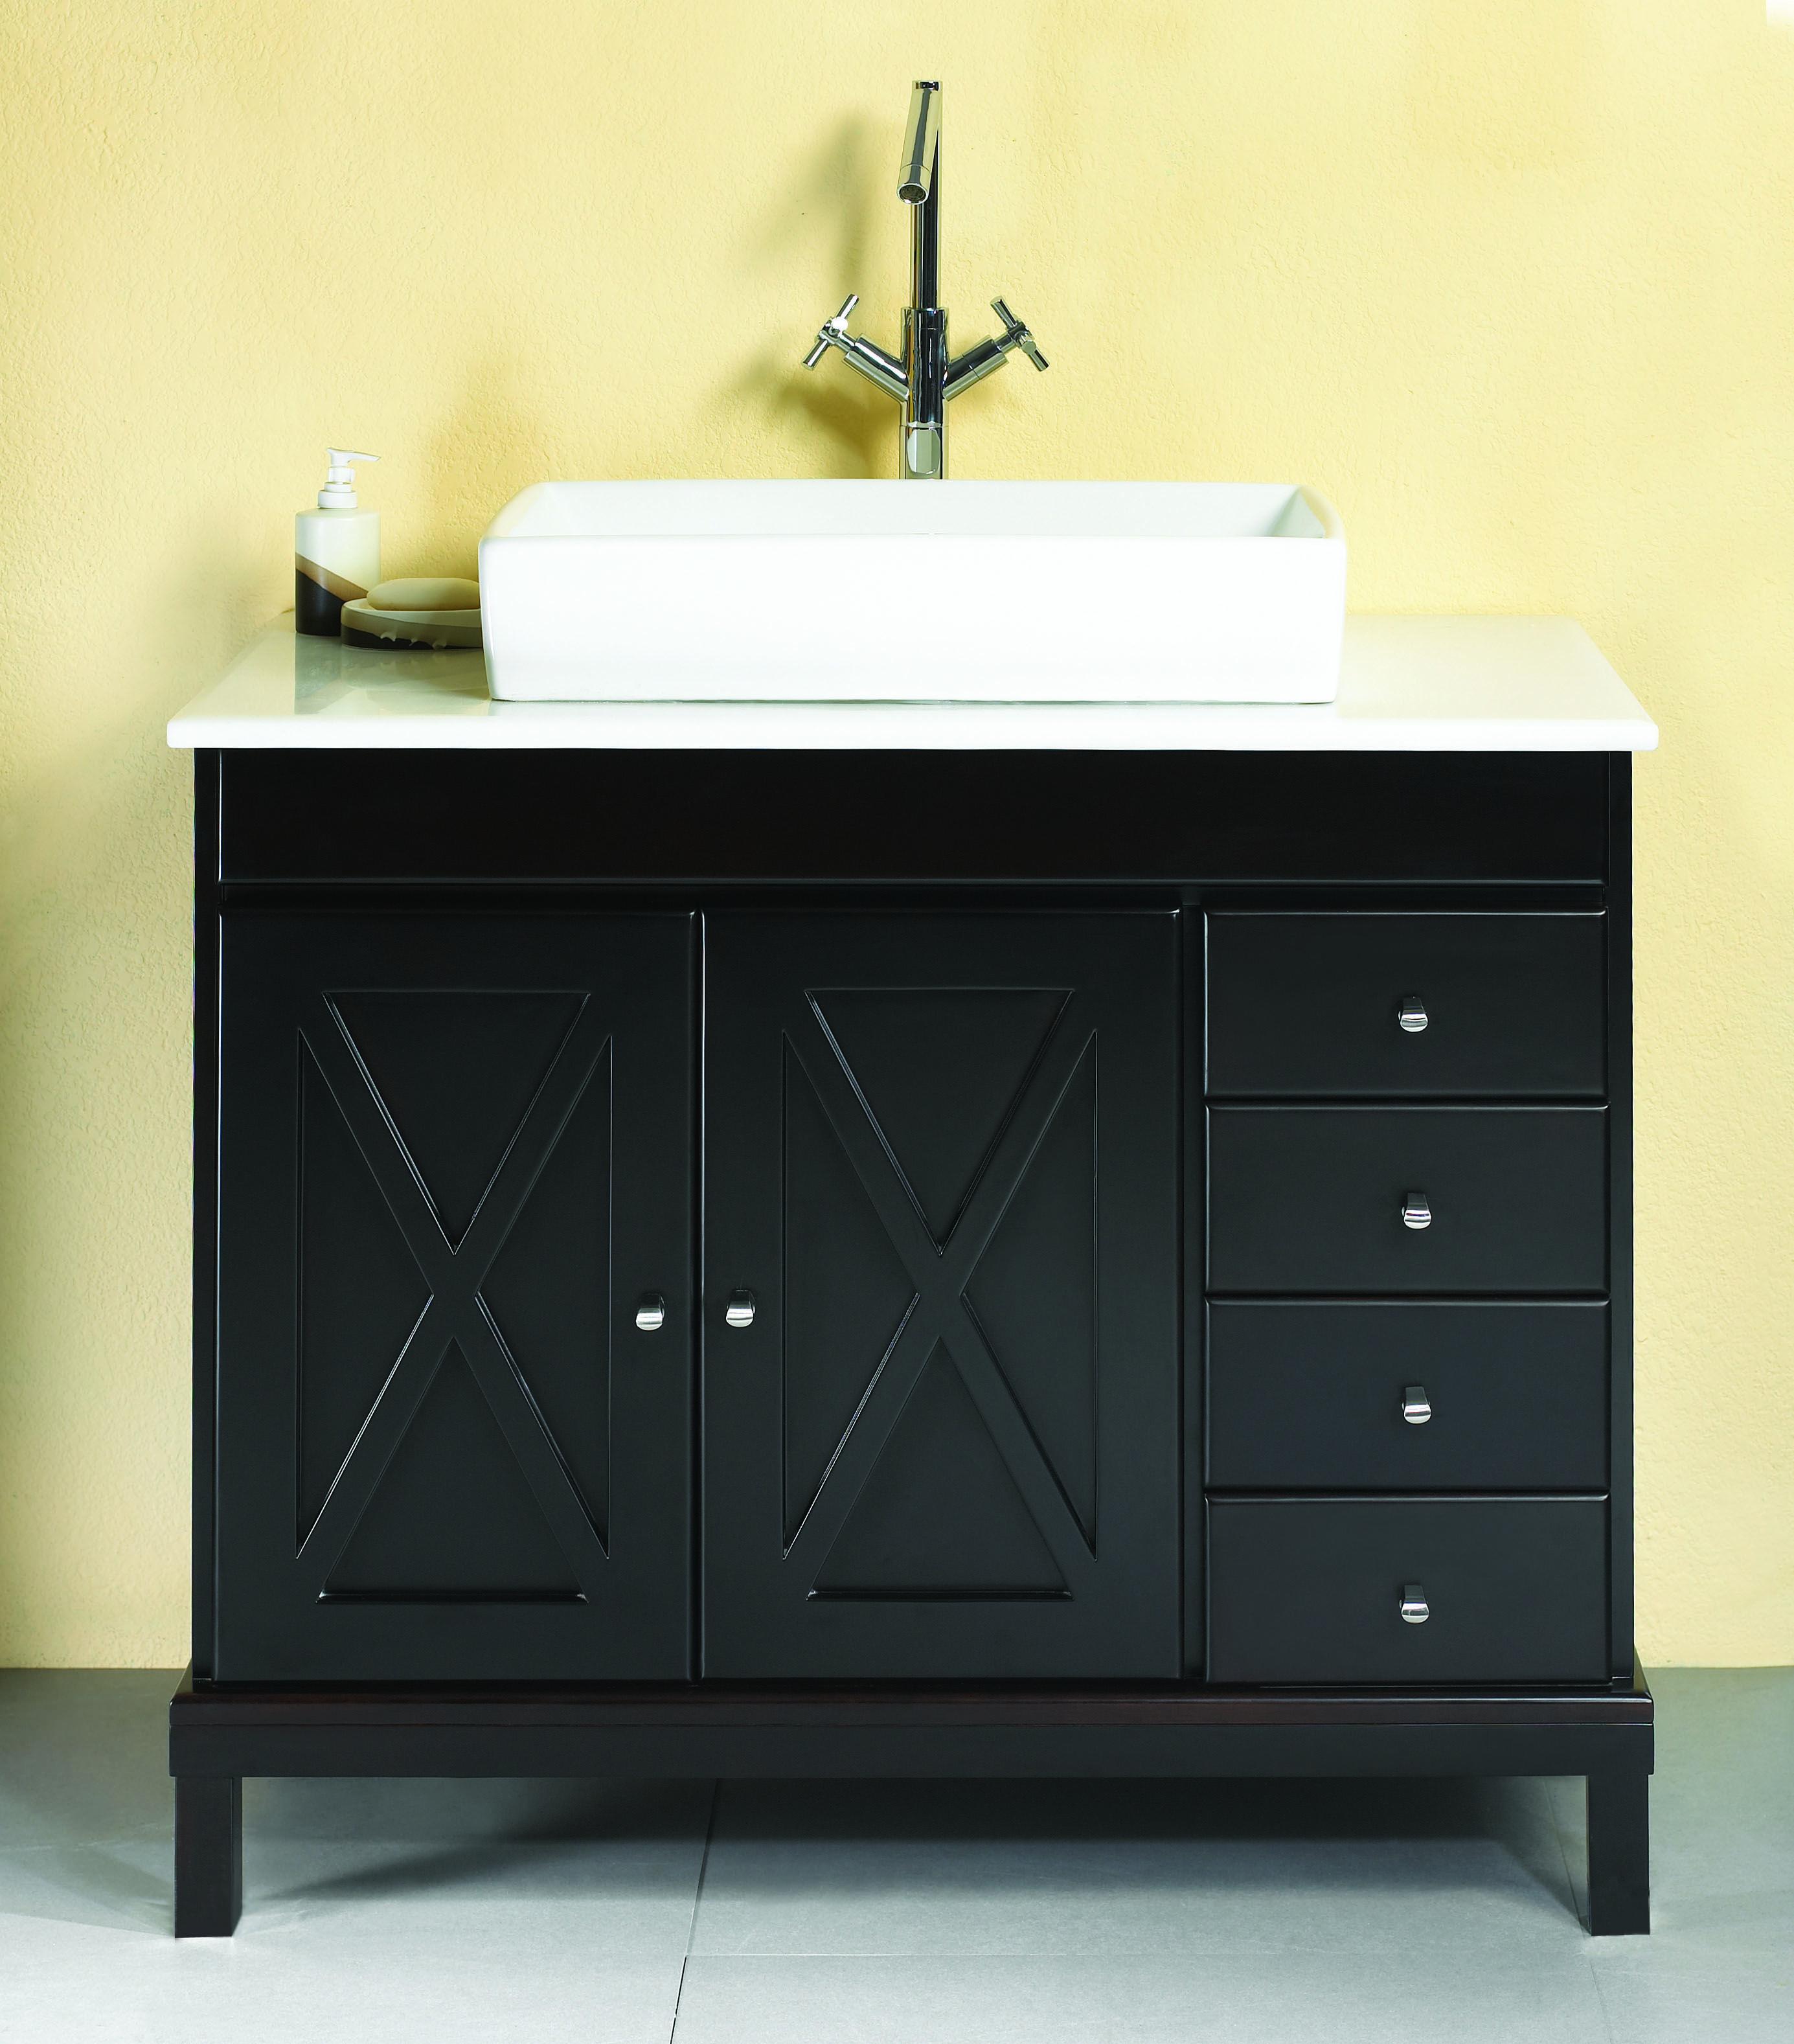 Rona Salle De Bain Vanite ~ add some contrast to your bathroom with the ove aspen vanity